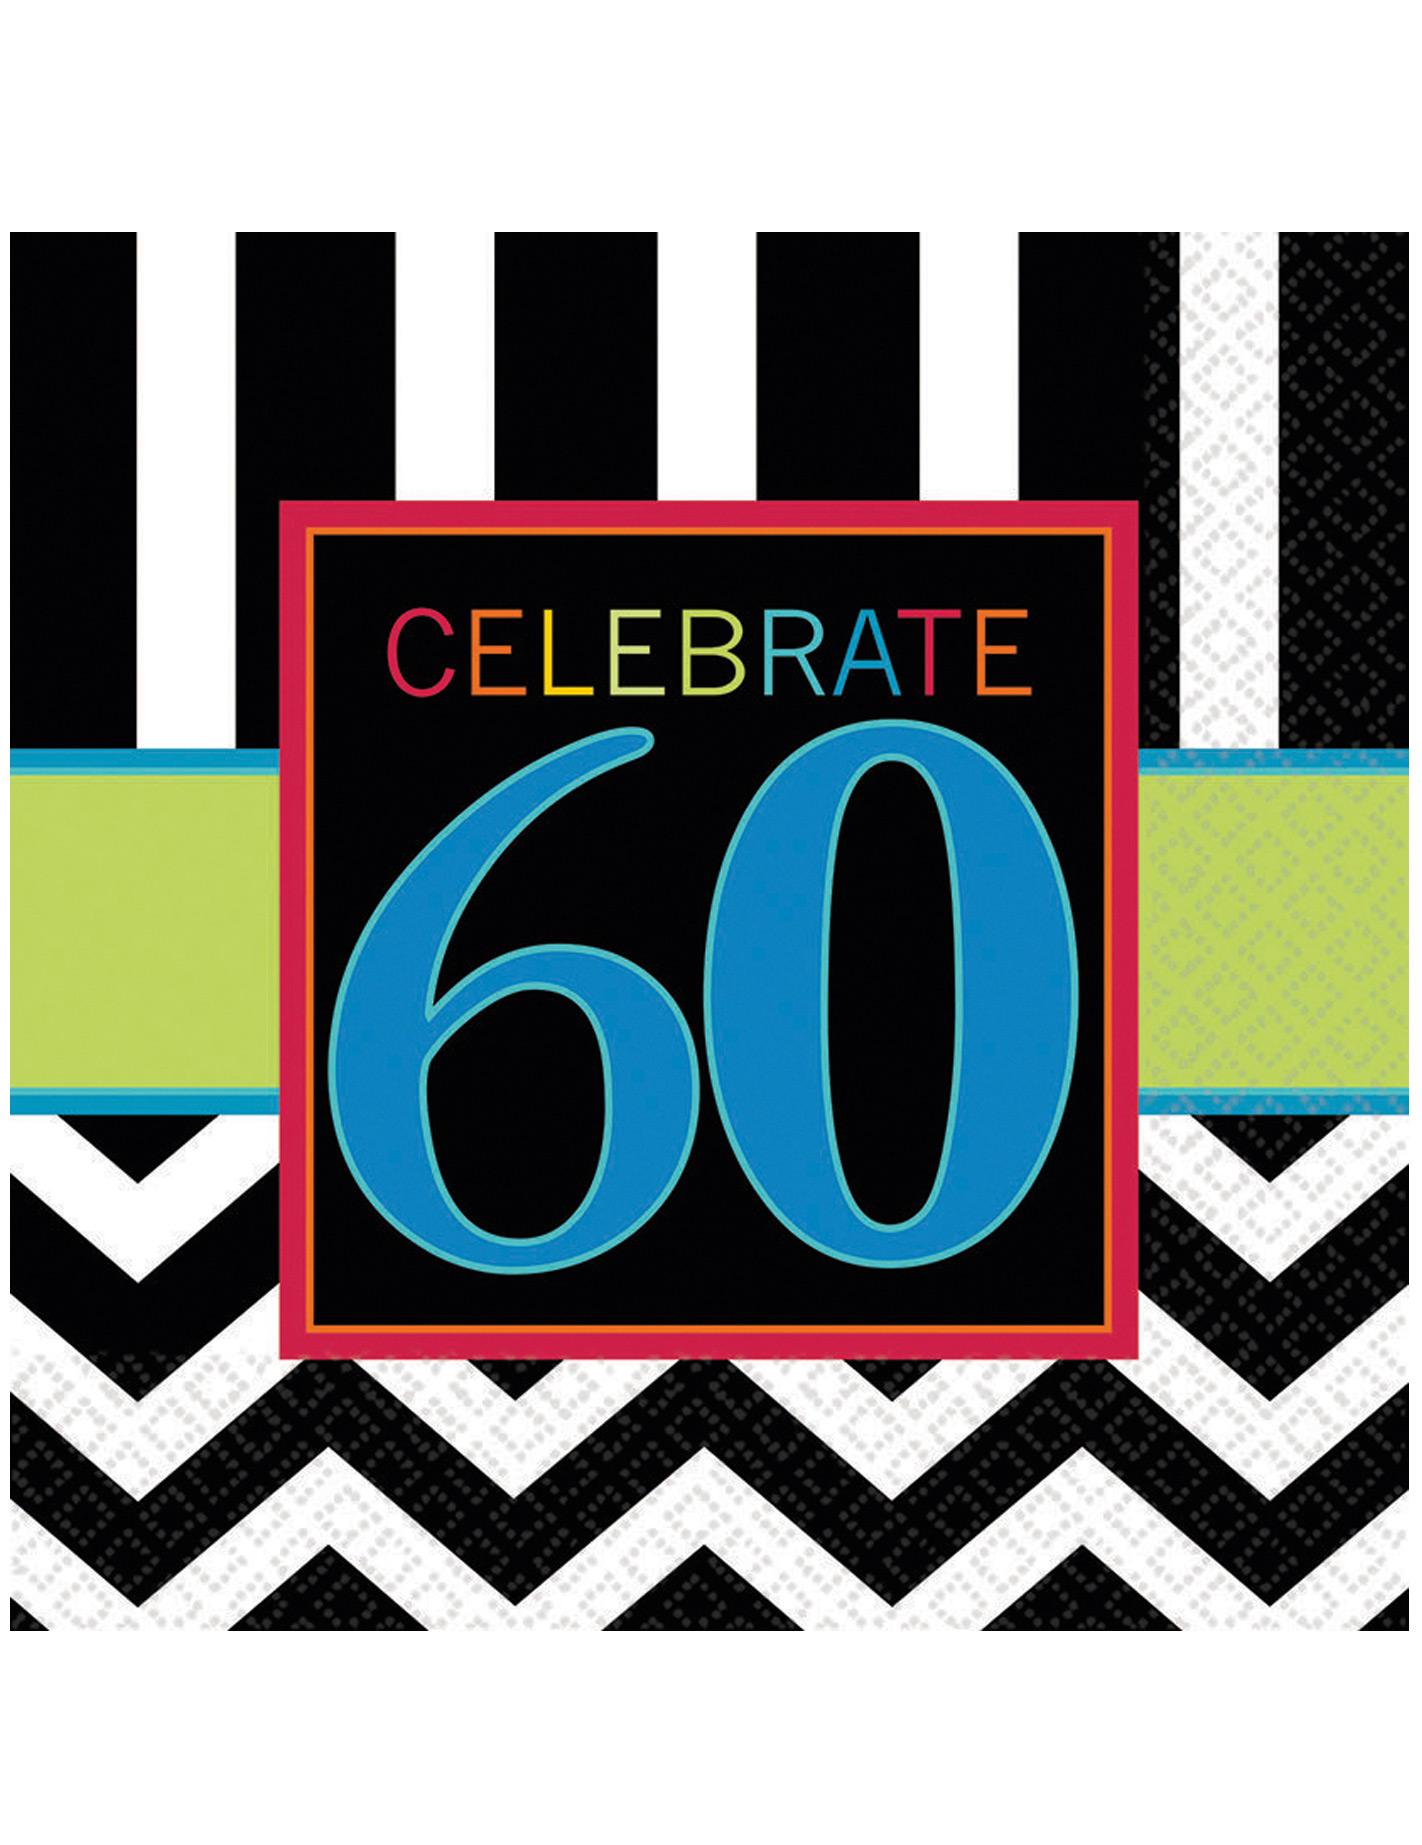 60 geburtstag servietten party deko 16 st ck bunt 33cm g nstige faschings bei karneval megastore. Black Bedroom Furniture Sets. Home Design Ideas